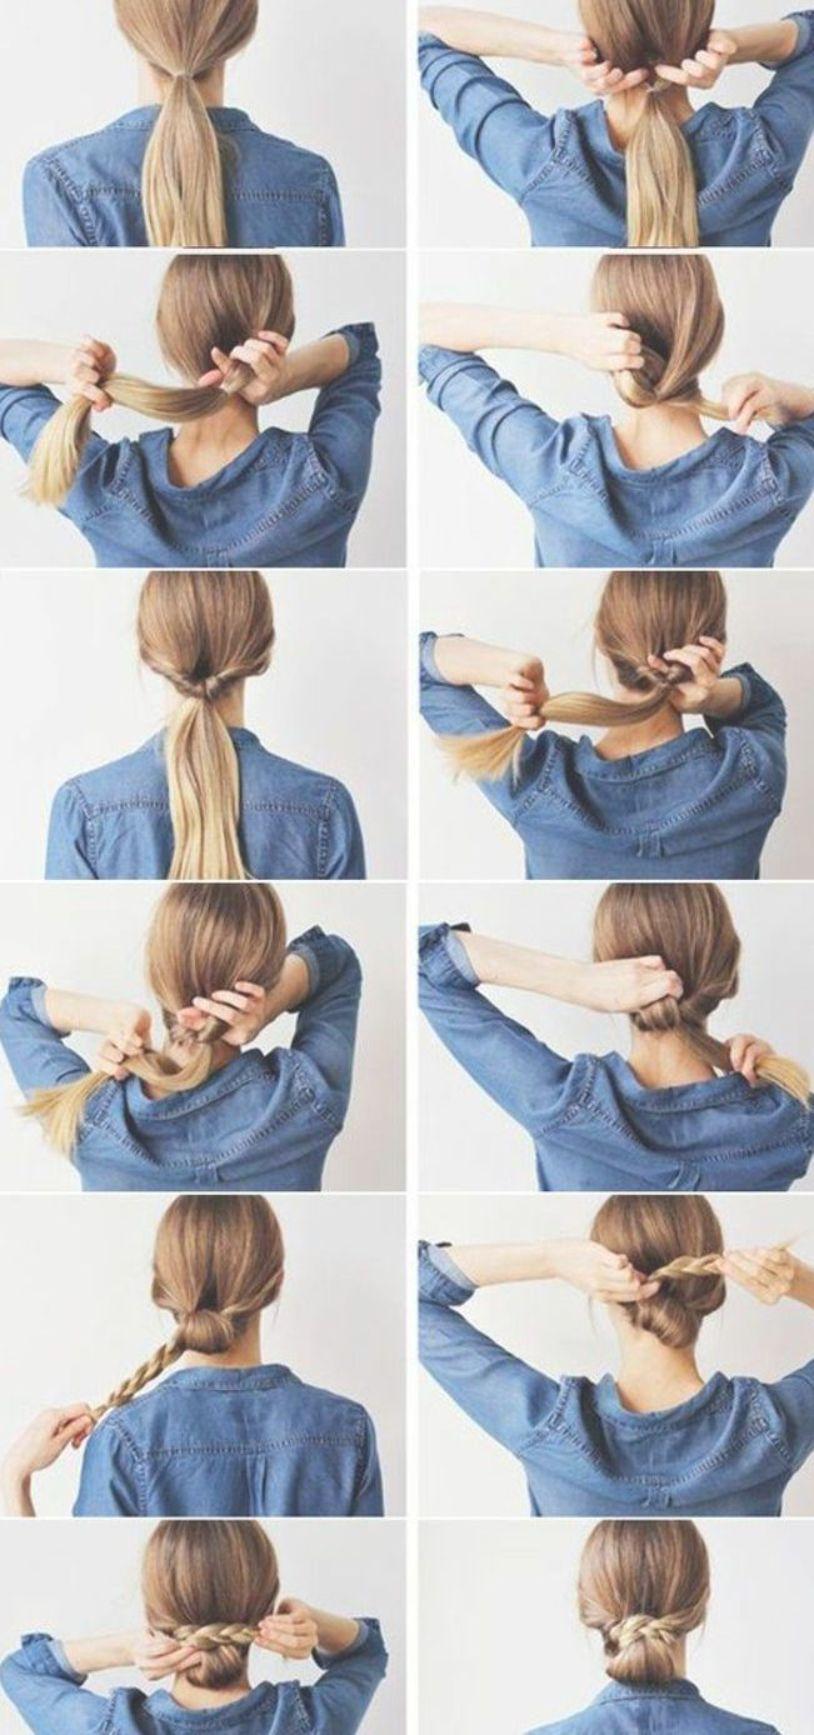 Great Idea For A Simple But Super Nice Hairstyle Simple Dress Ha Dress Great Ha Hairstyle Low Bun Hairstyles Braided Bun Styles Hair Diy Tutorial